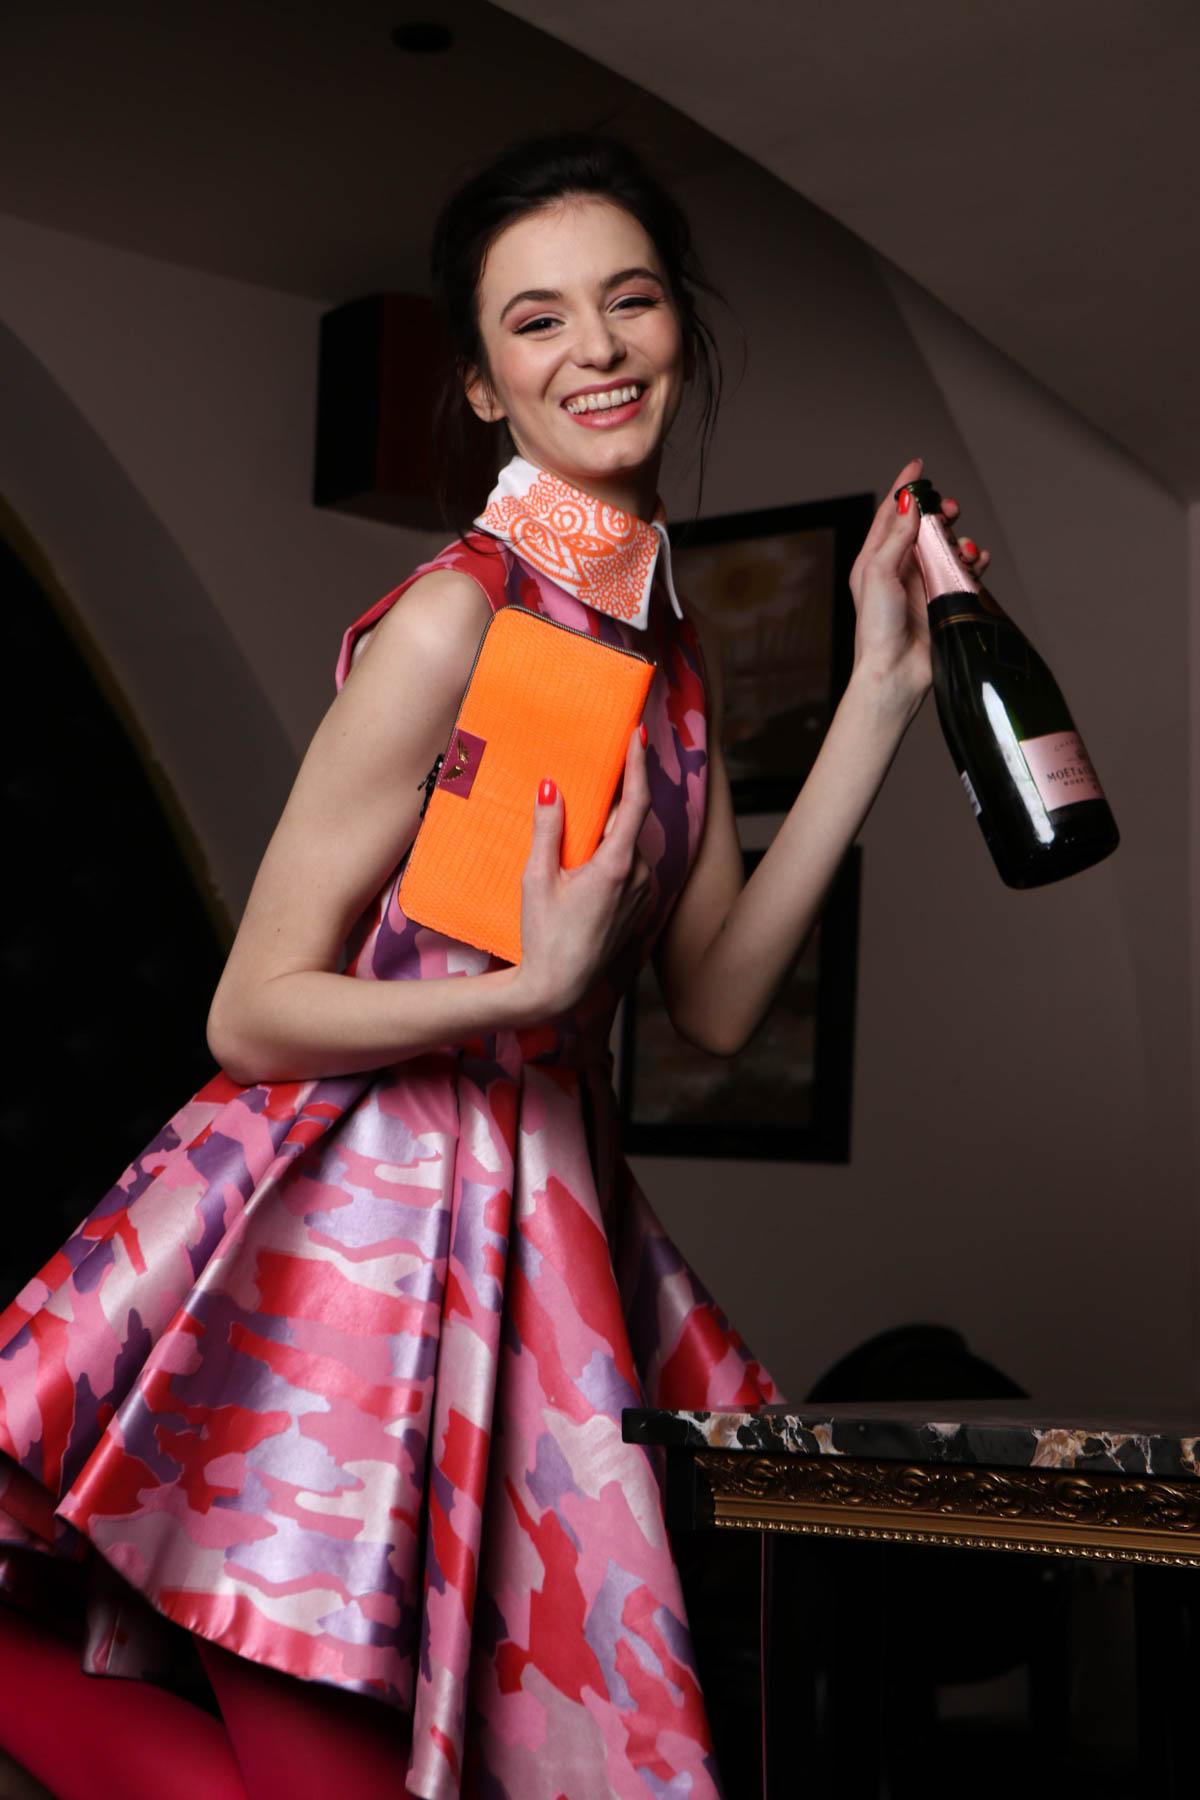 David Bacali / obleka roza / 300 eur  Princip / ovratnik / 29eur  Zelolepo / denarnica / 90eur